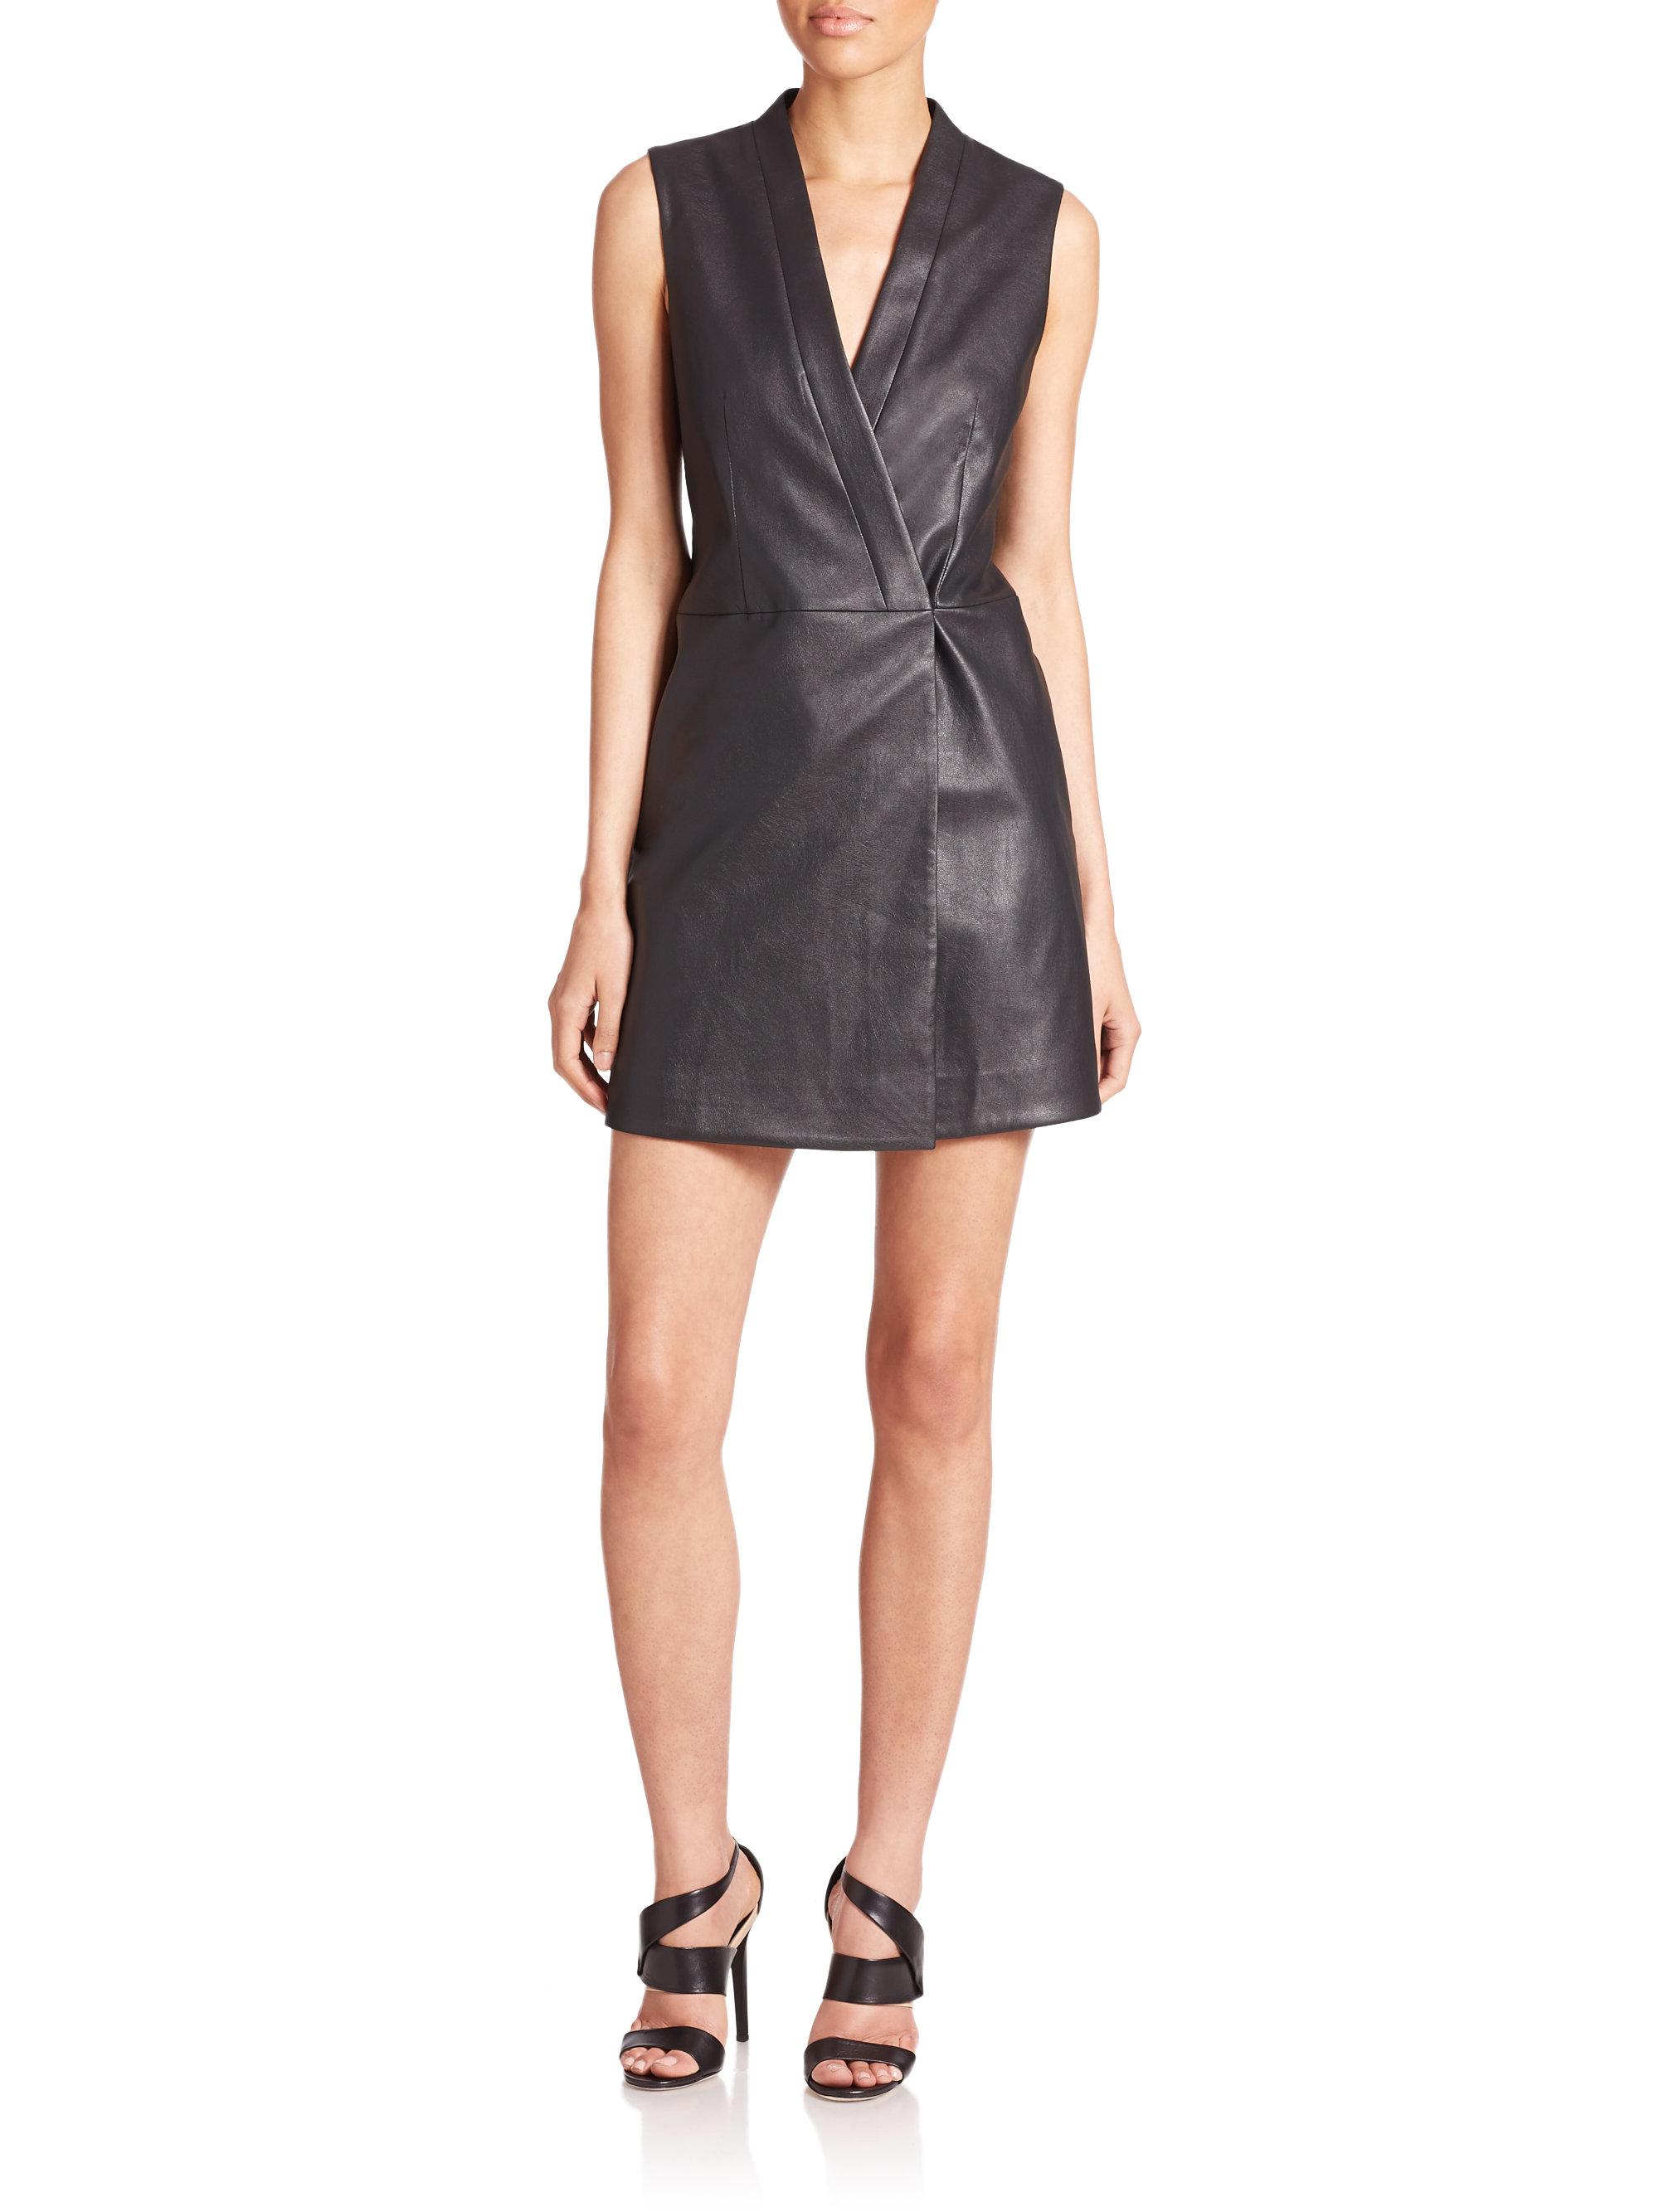 Lyst Bcbgmaxazria Caryn Faux Leather Vest Dress In Black